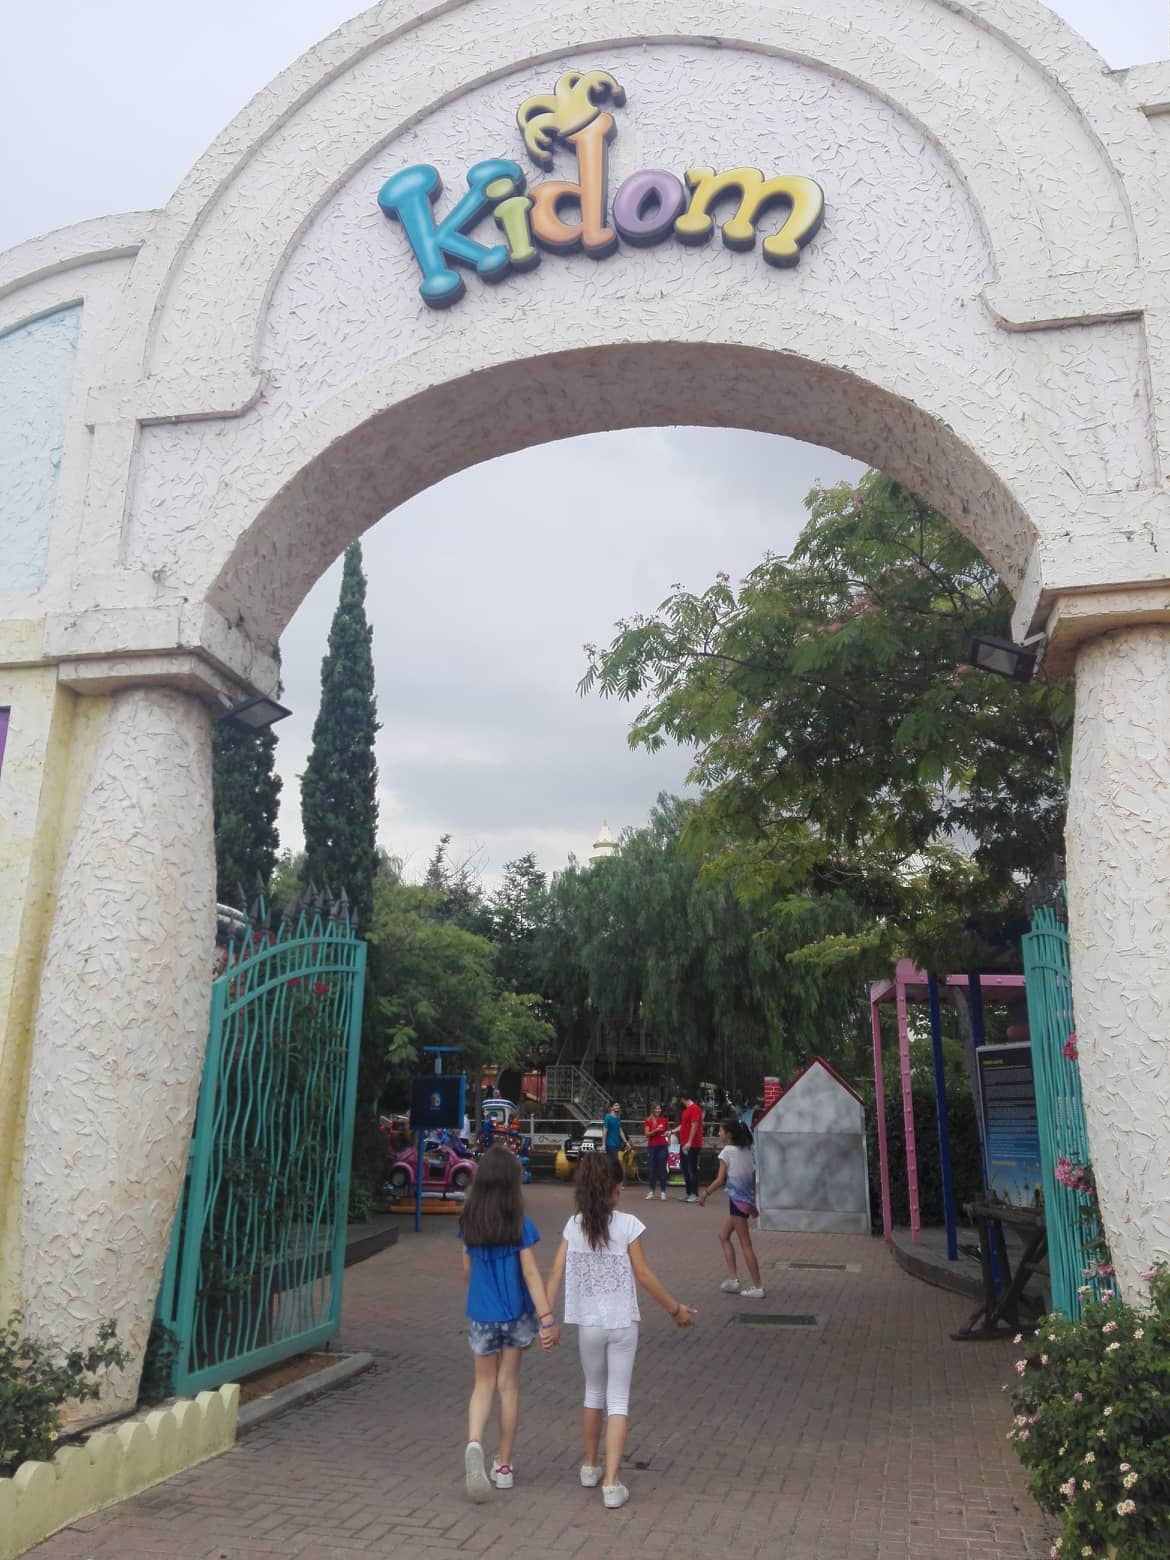 kidom allou fun park 17